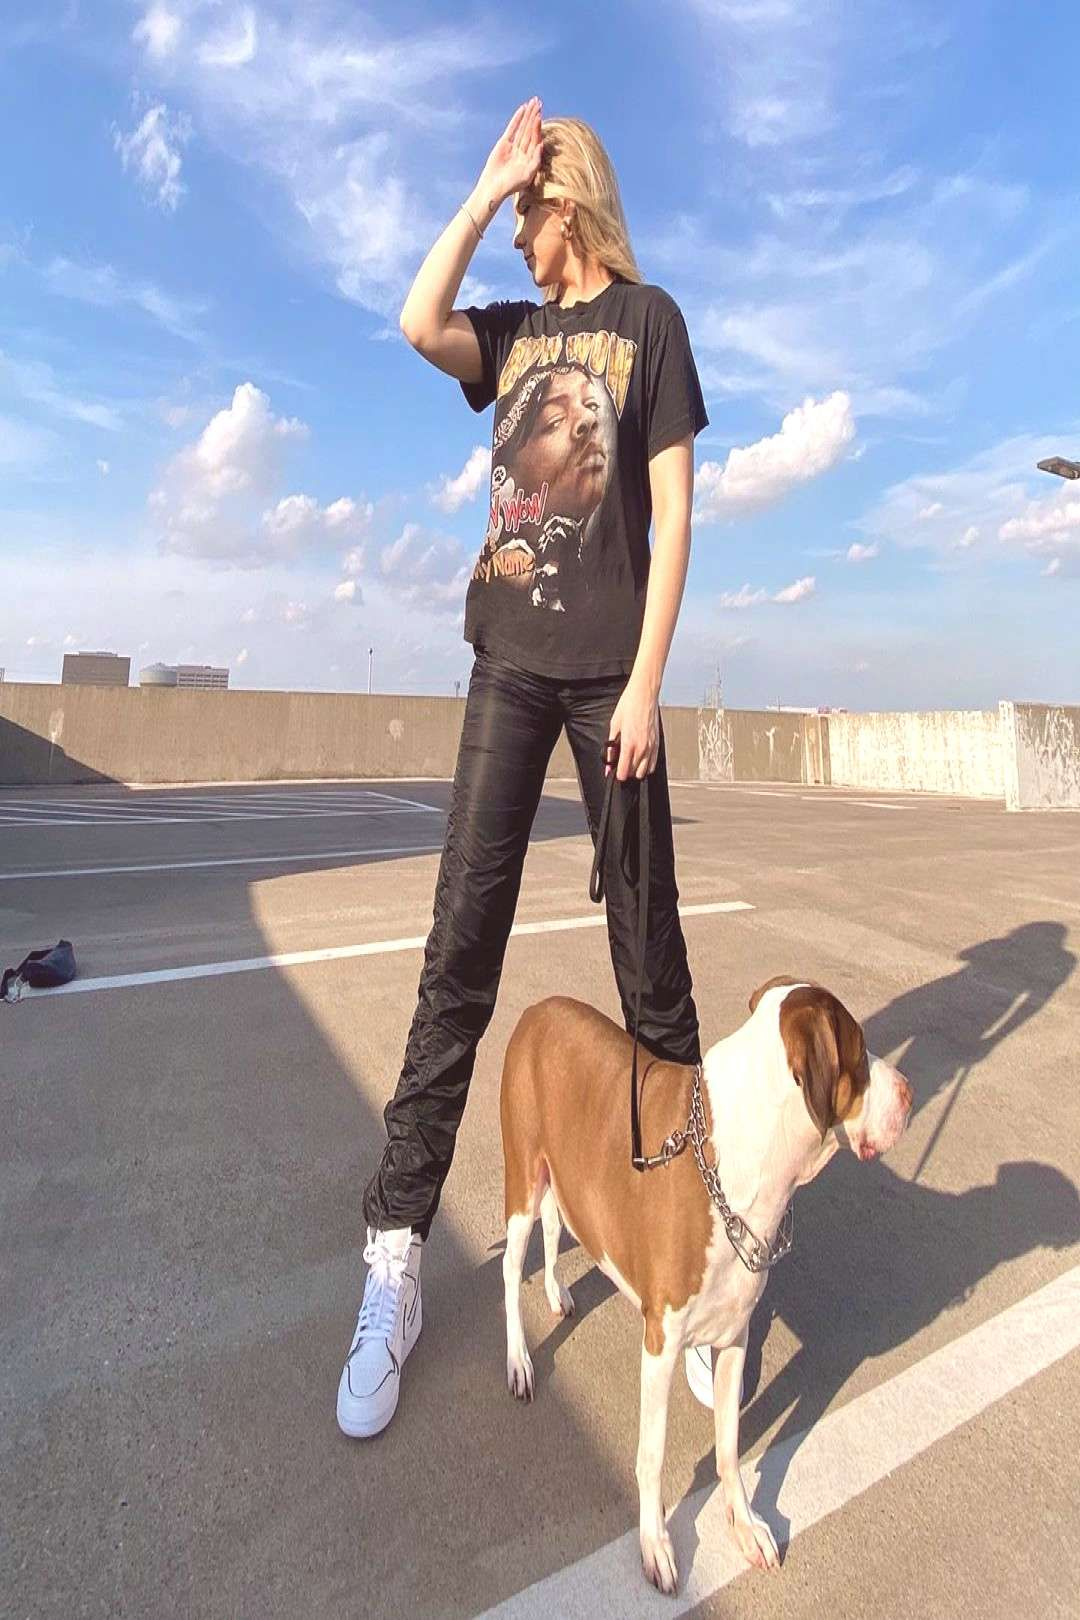 Jordanretro Outdoor Person Dog Sky